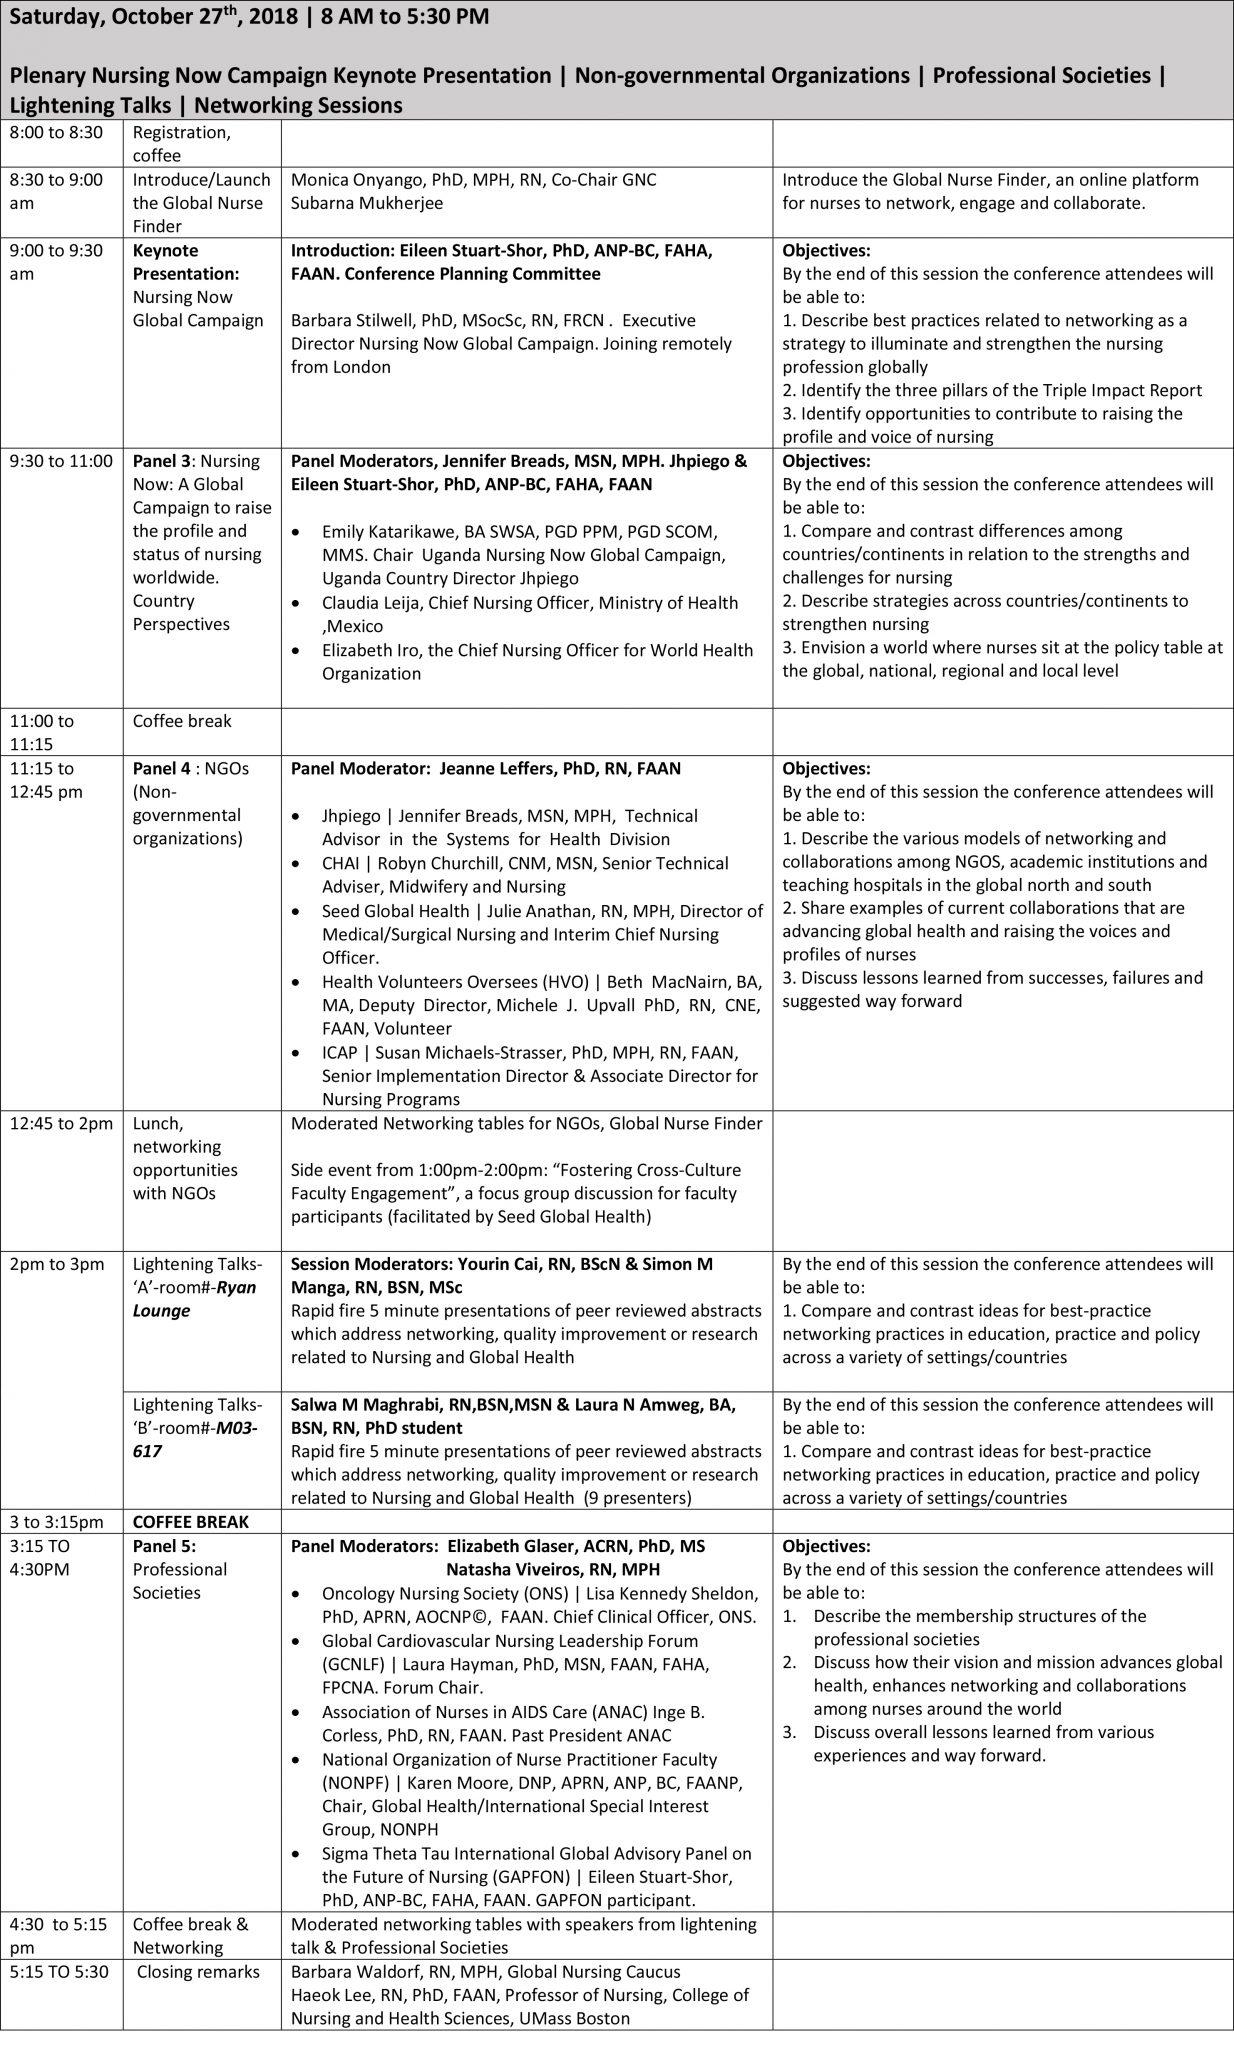 Panel Descriptions and Speaker Biographies